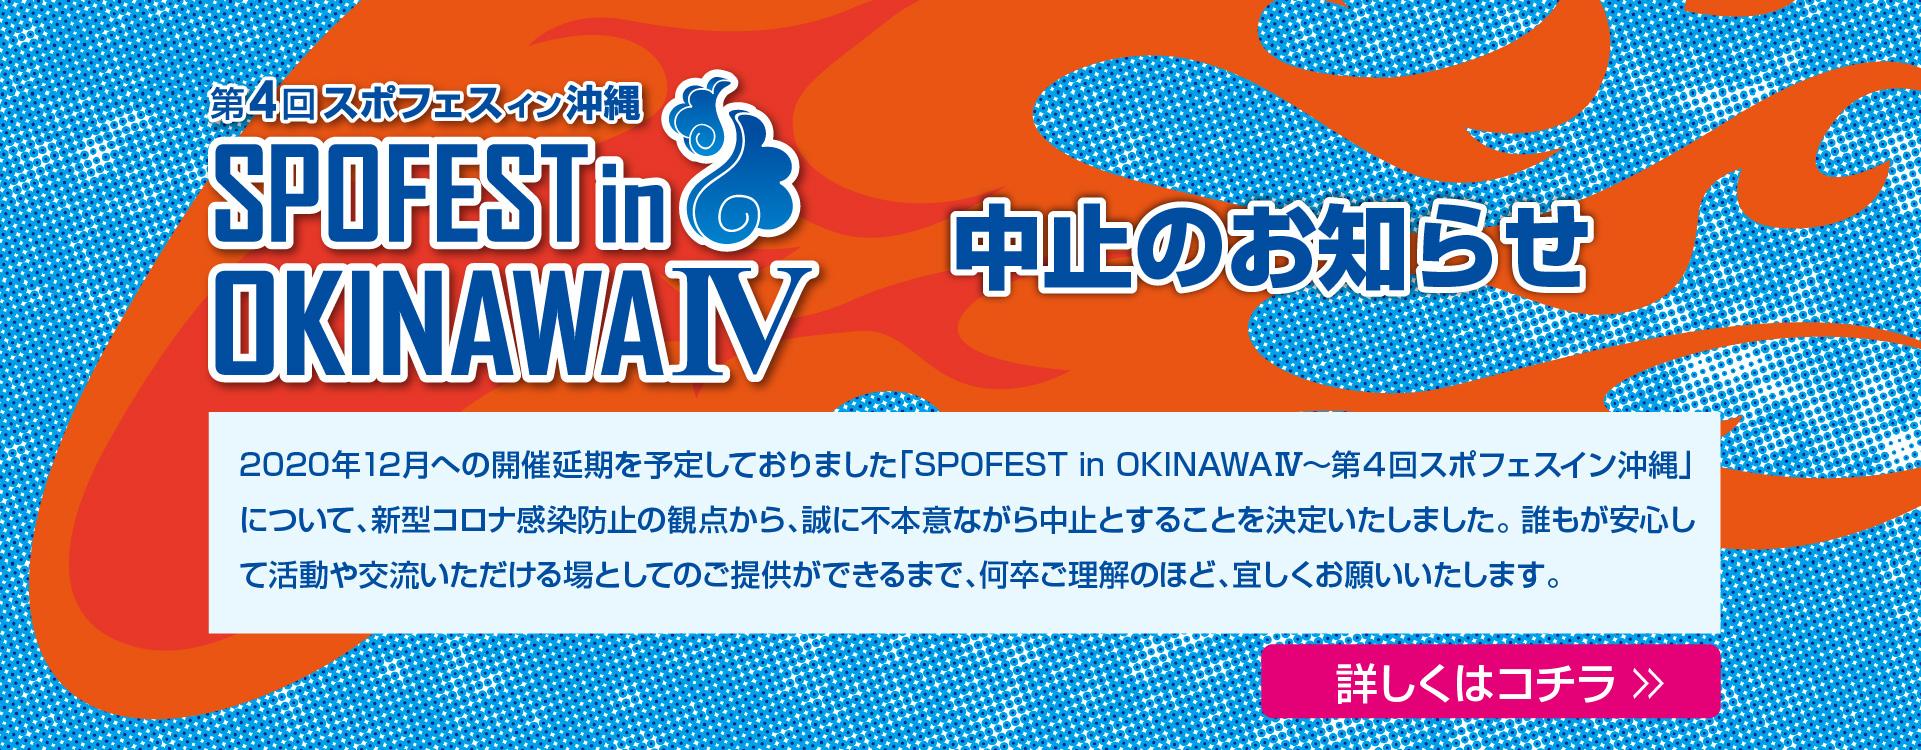 spofest in okinawa